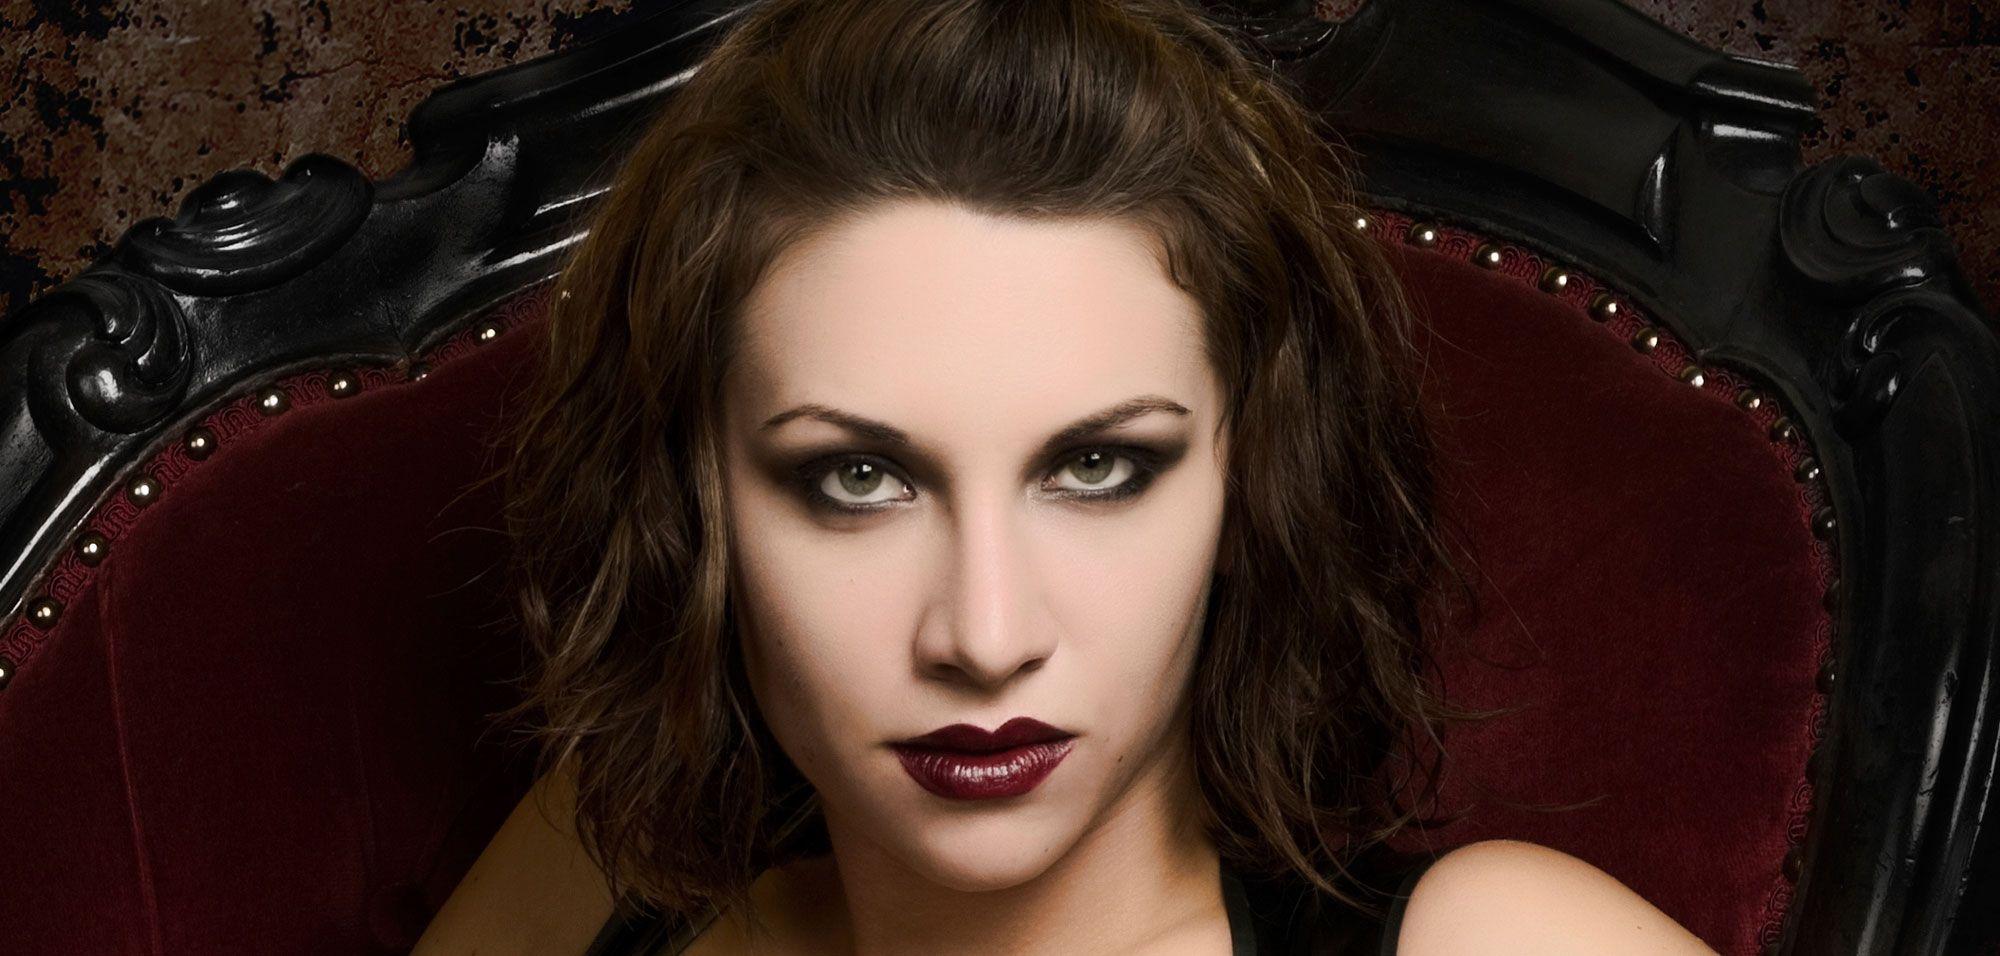 piel maquillaje vampiresa